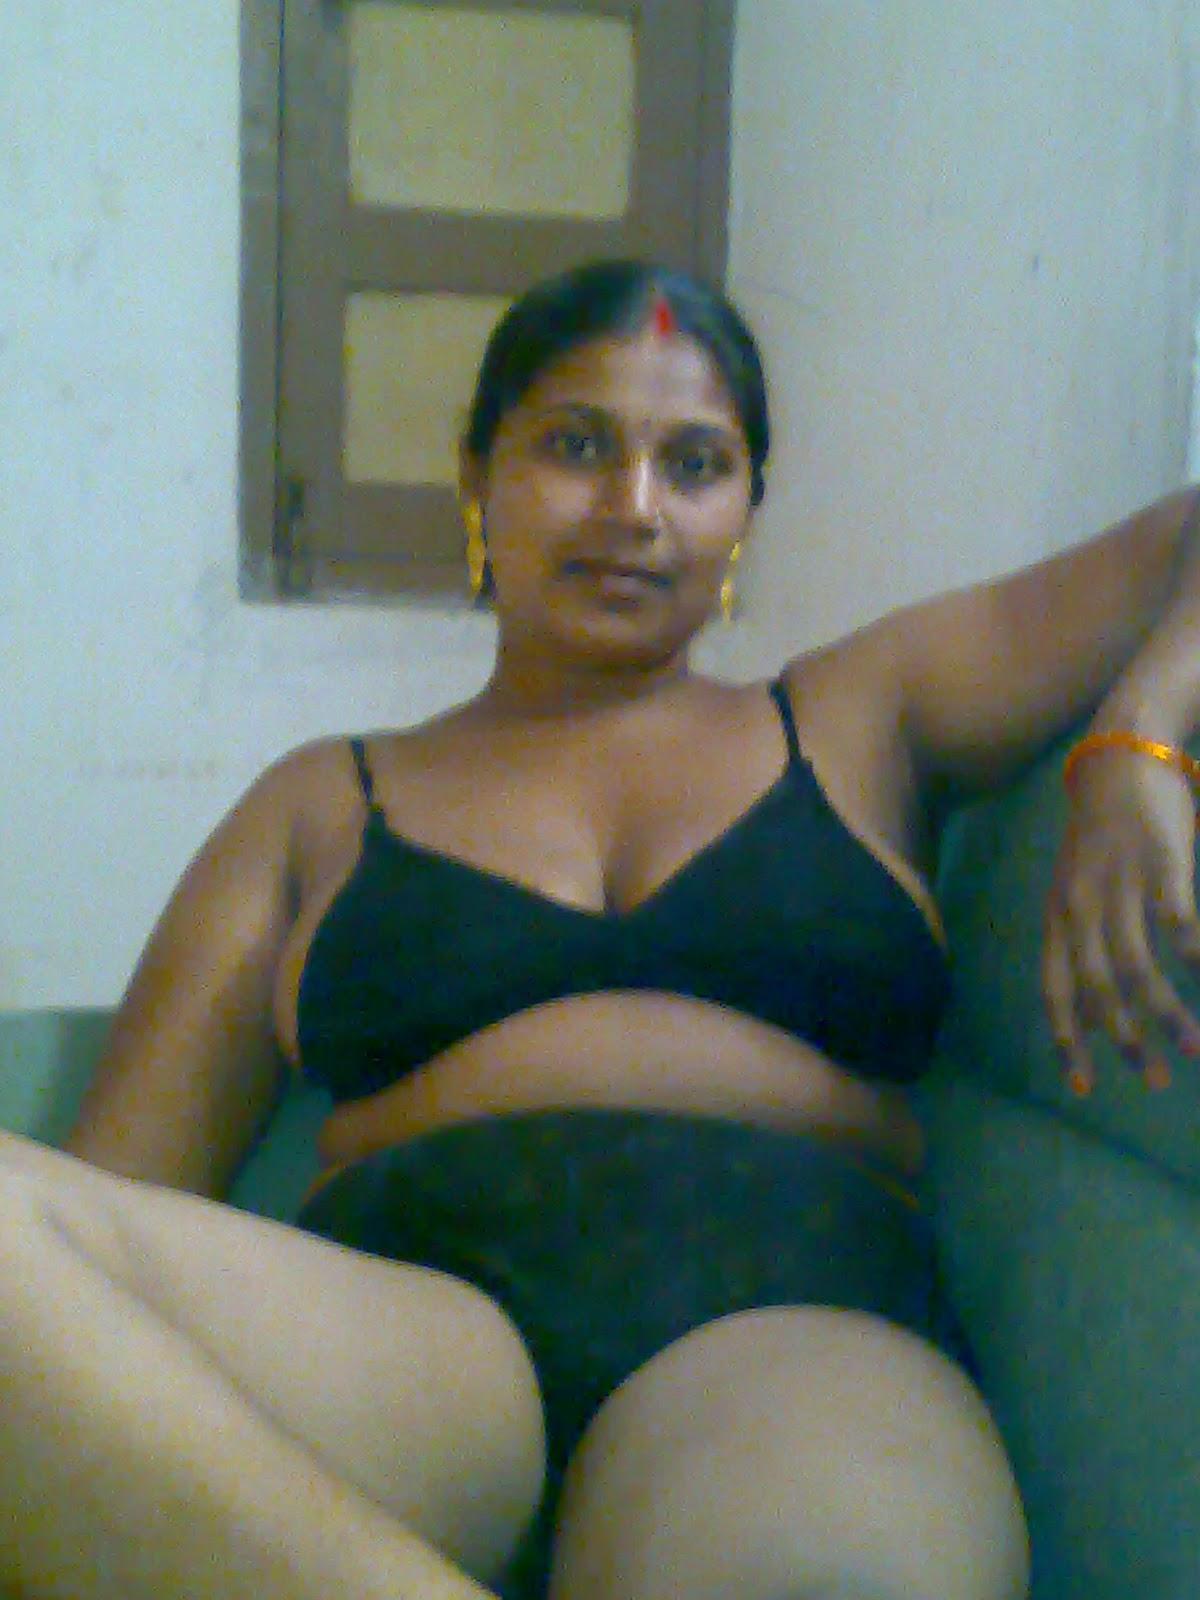 Desi aunty sex scene, innocent mexican girl nude